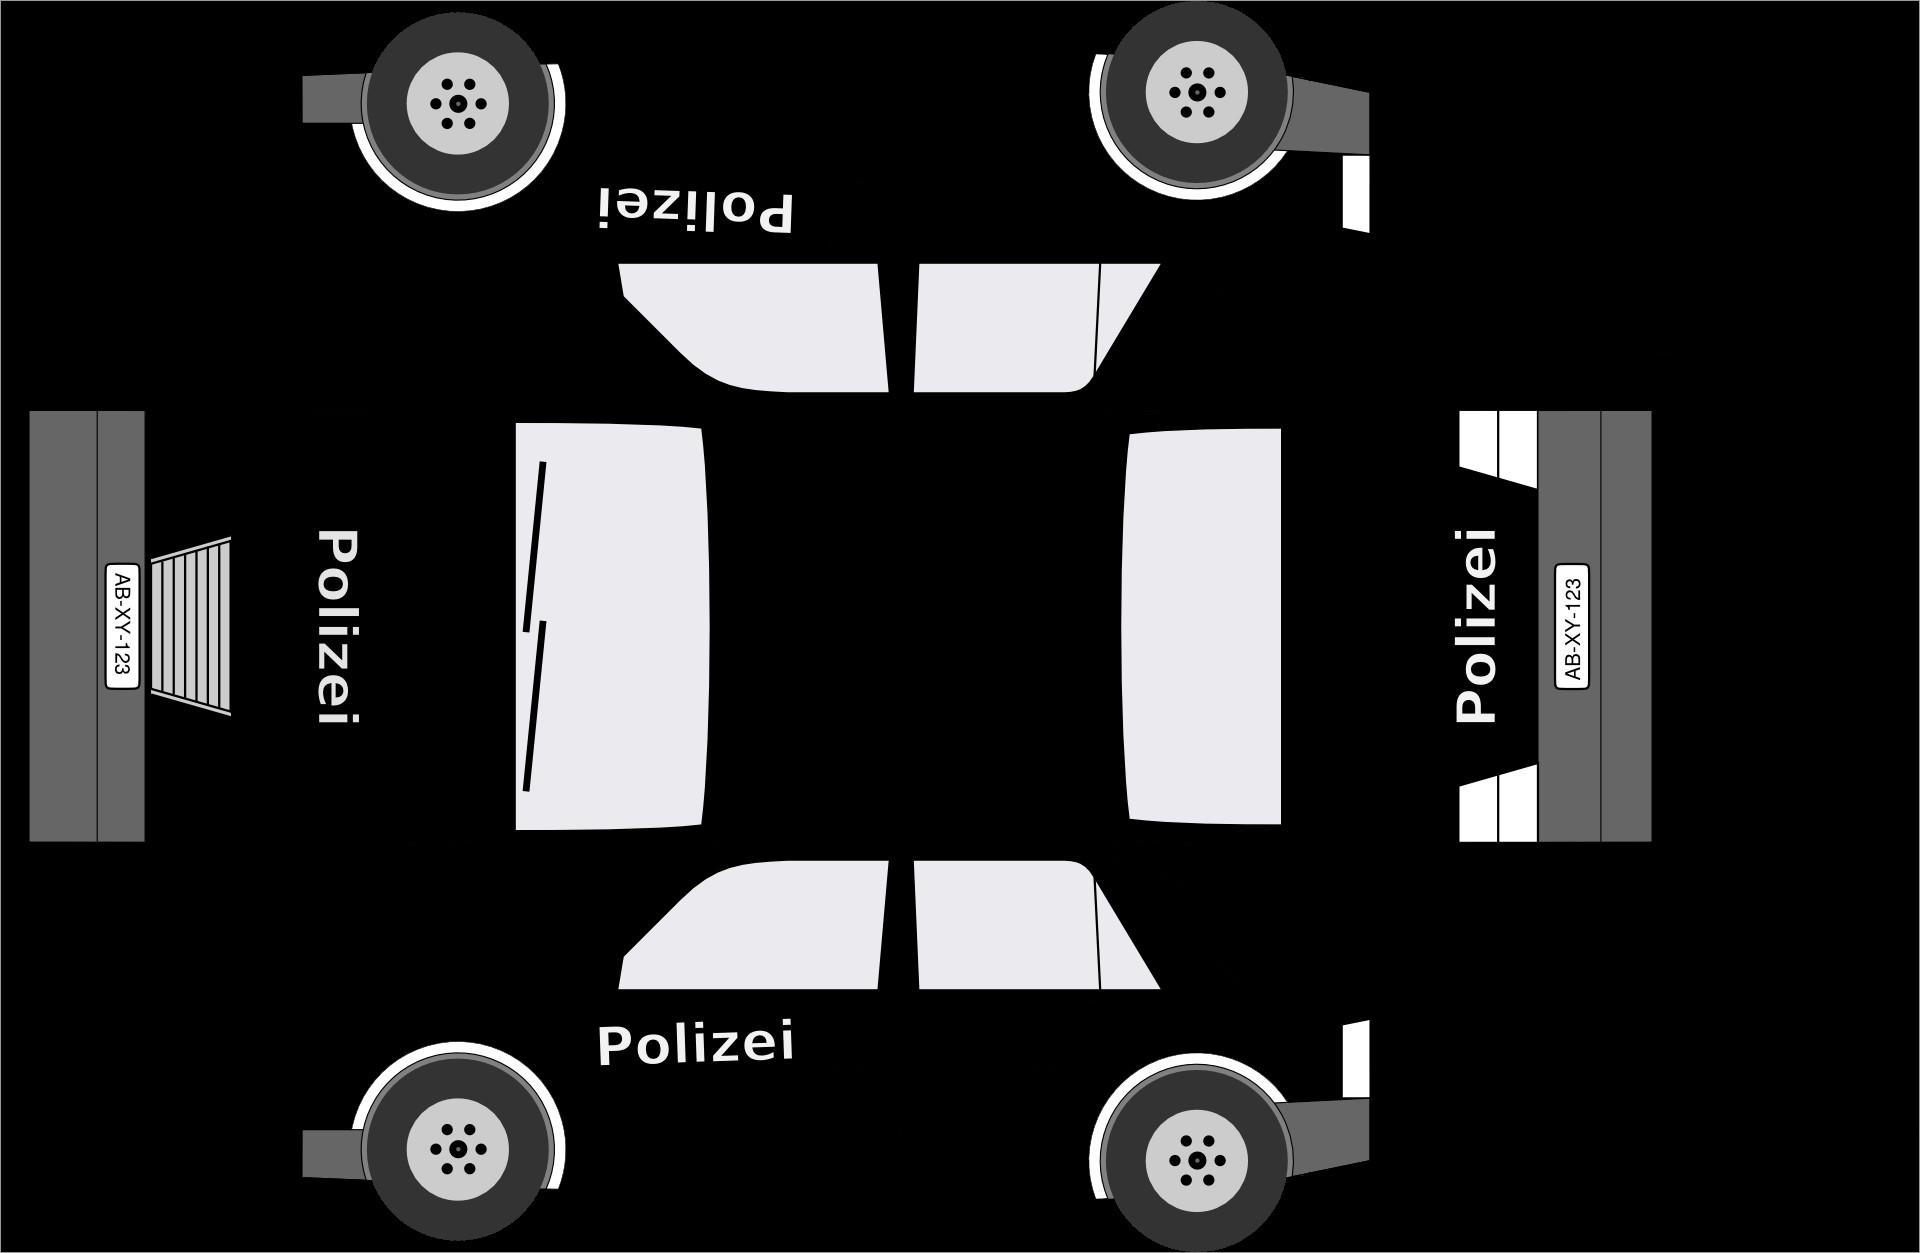 Papercraft Car Black and White German Police Car Papercraft